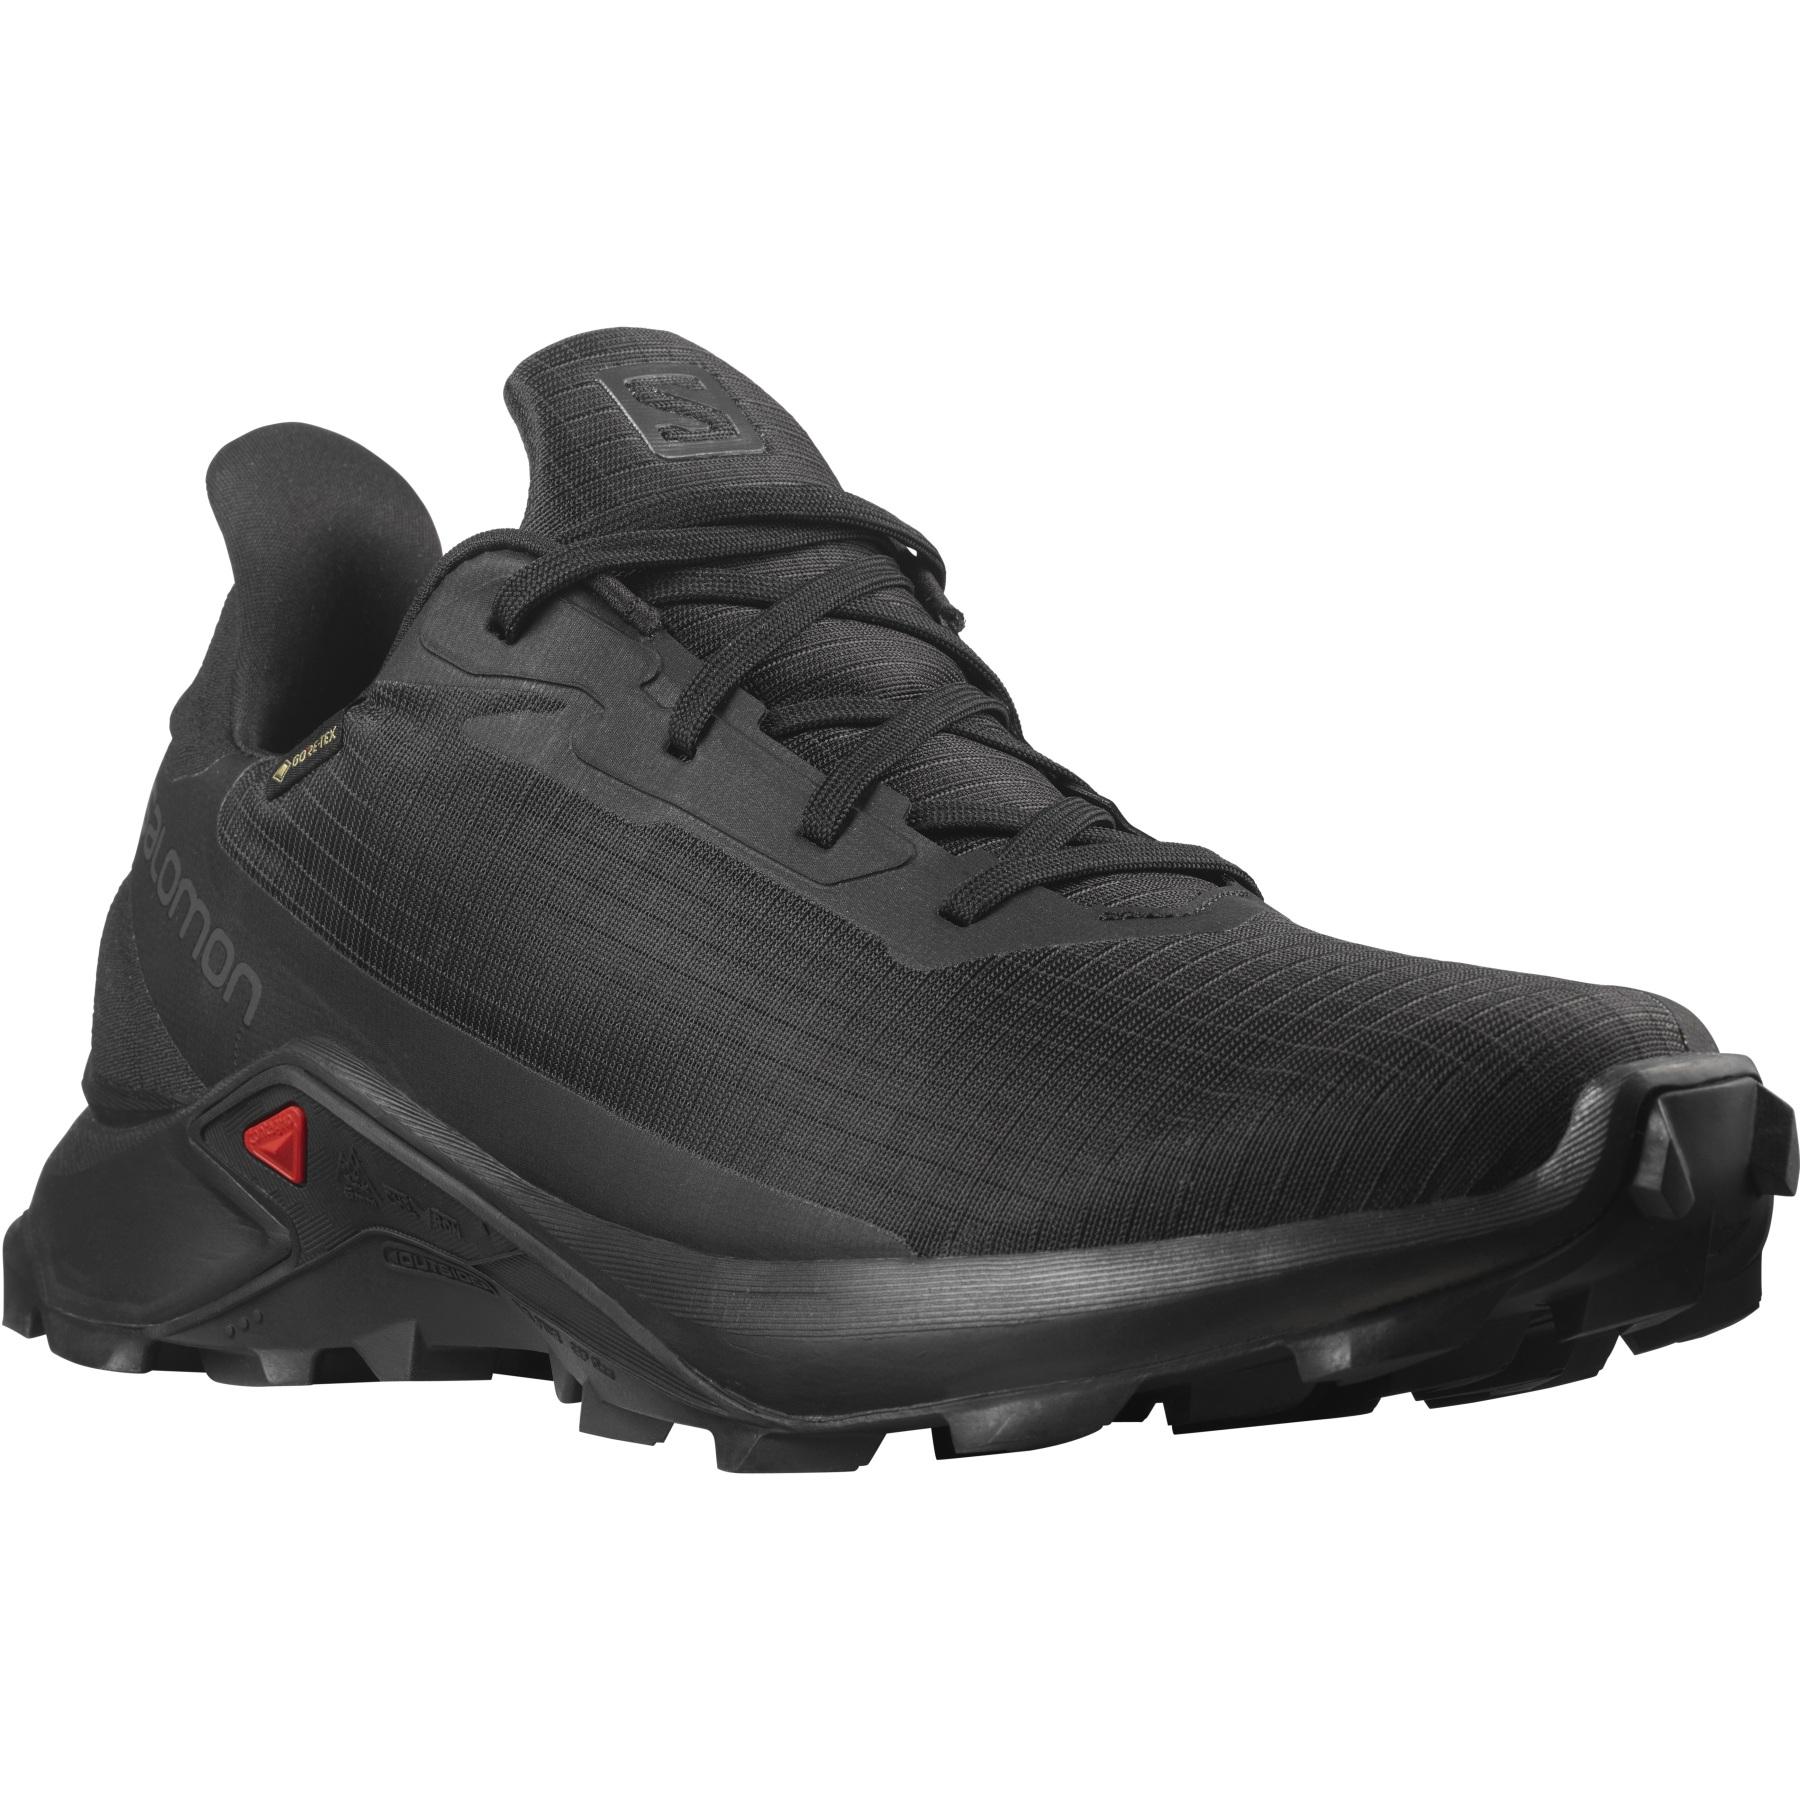 Produktbild von Salomon Alphacross 3 Gore-Tex Trail Laufschuhe - black/black/black